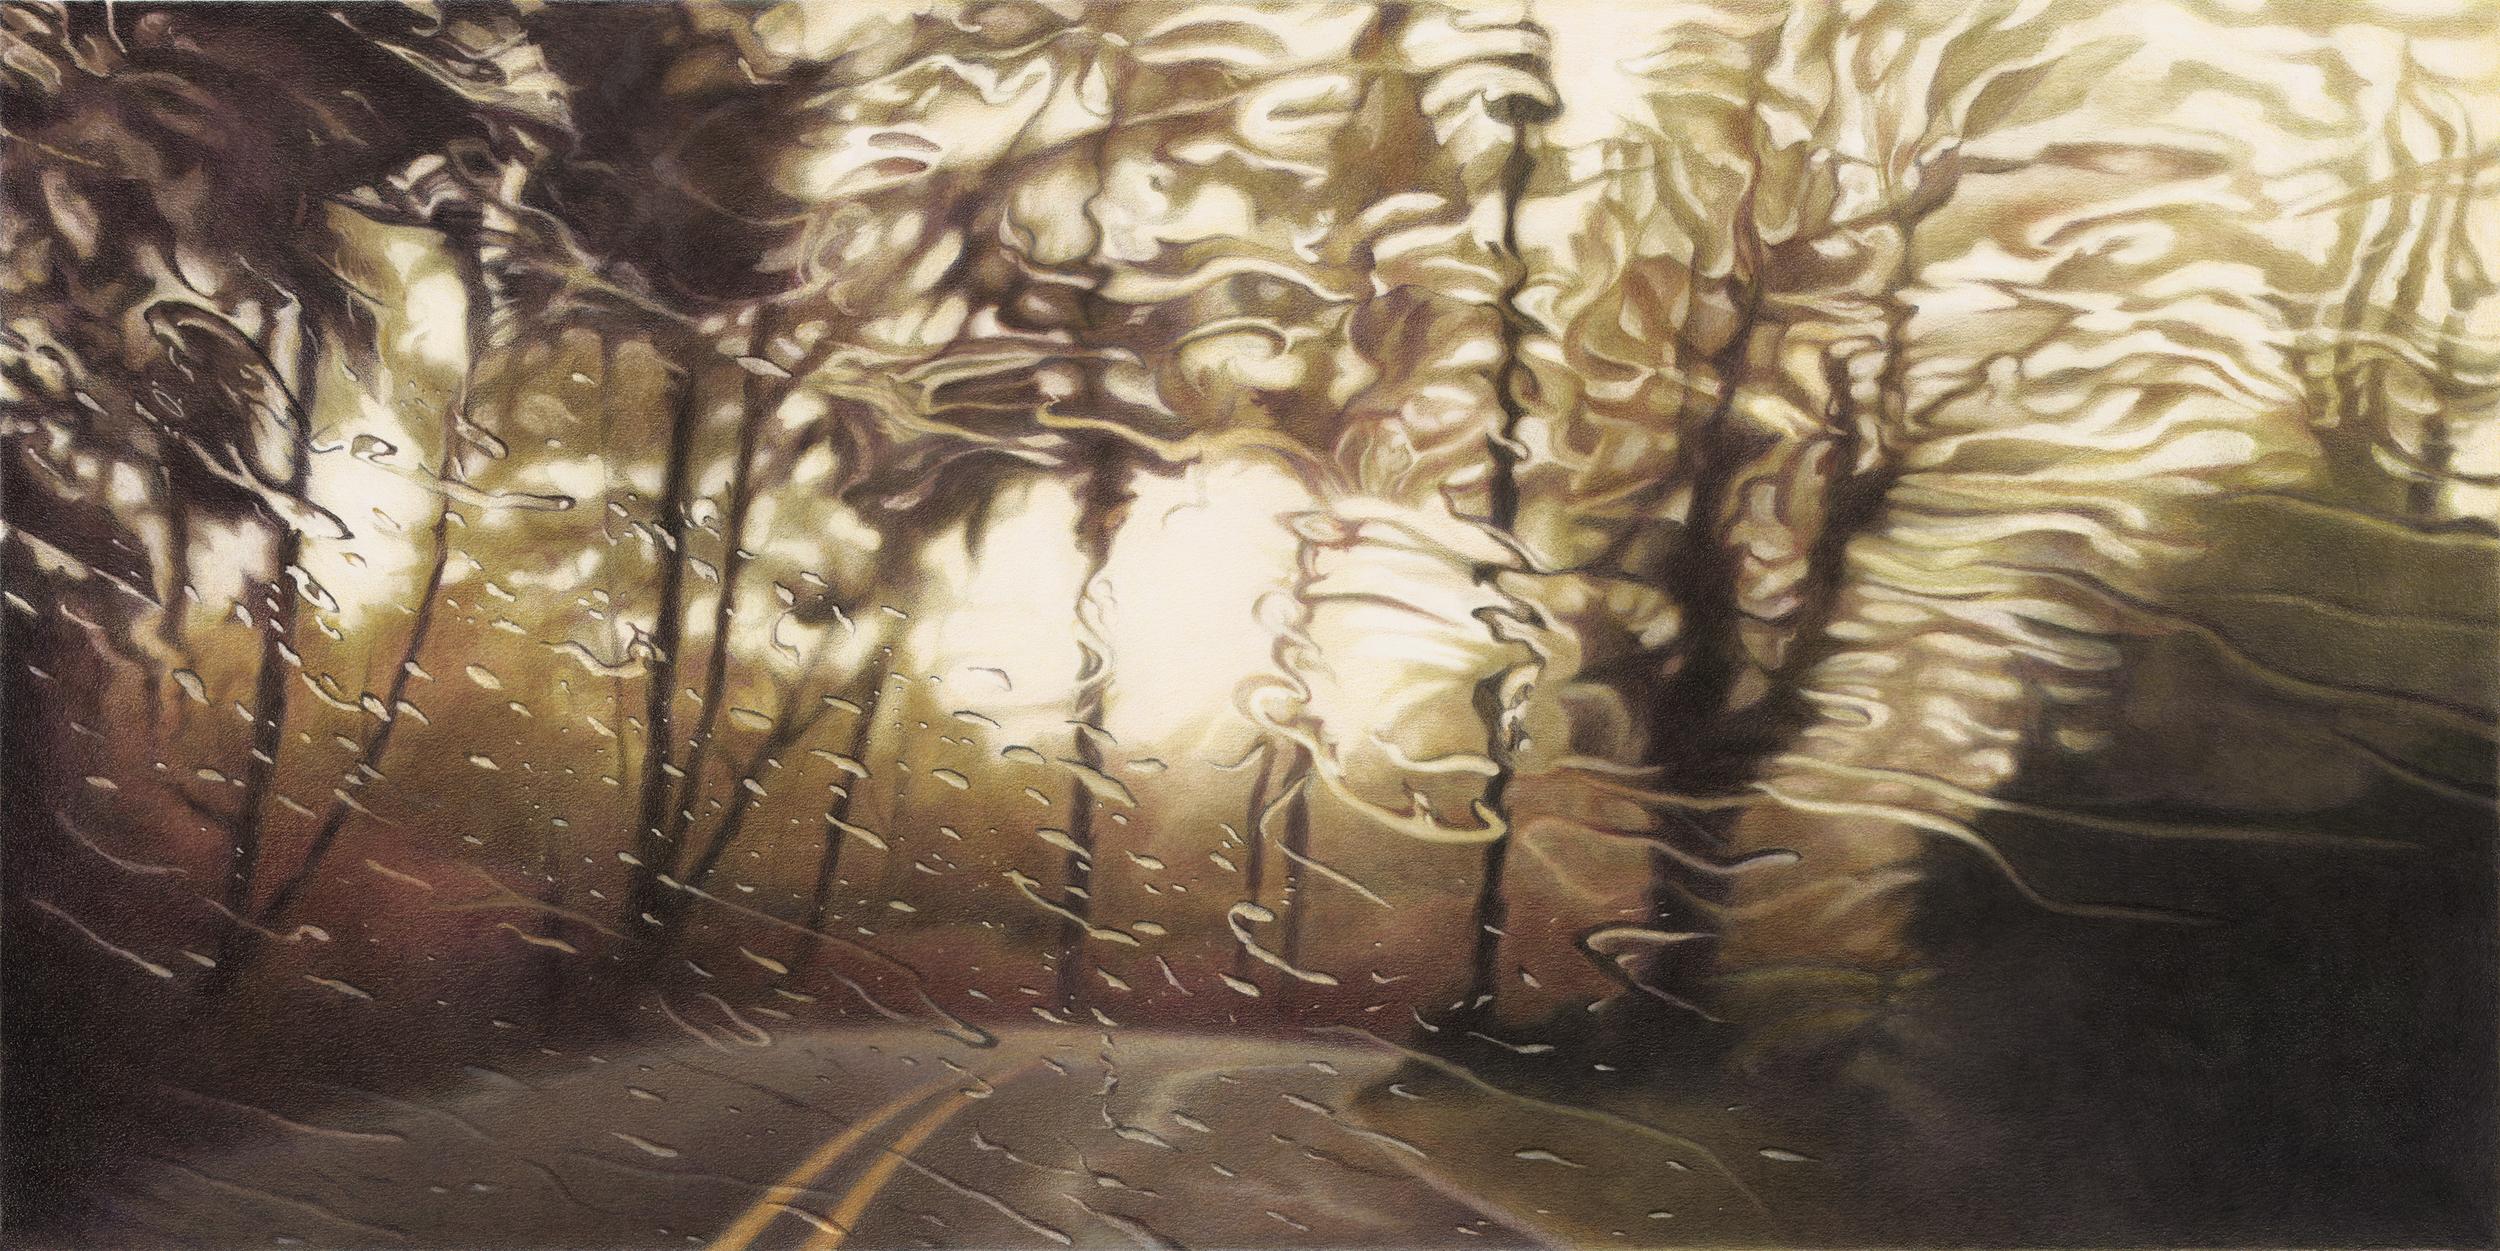 Elizabeth Patterson,  Idleman Road, 3PM, 2010, color pencil, graphite and solvent on Strathmore Bristol Vellum, 20 x 34 inches